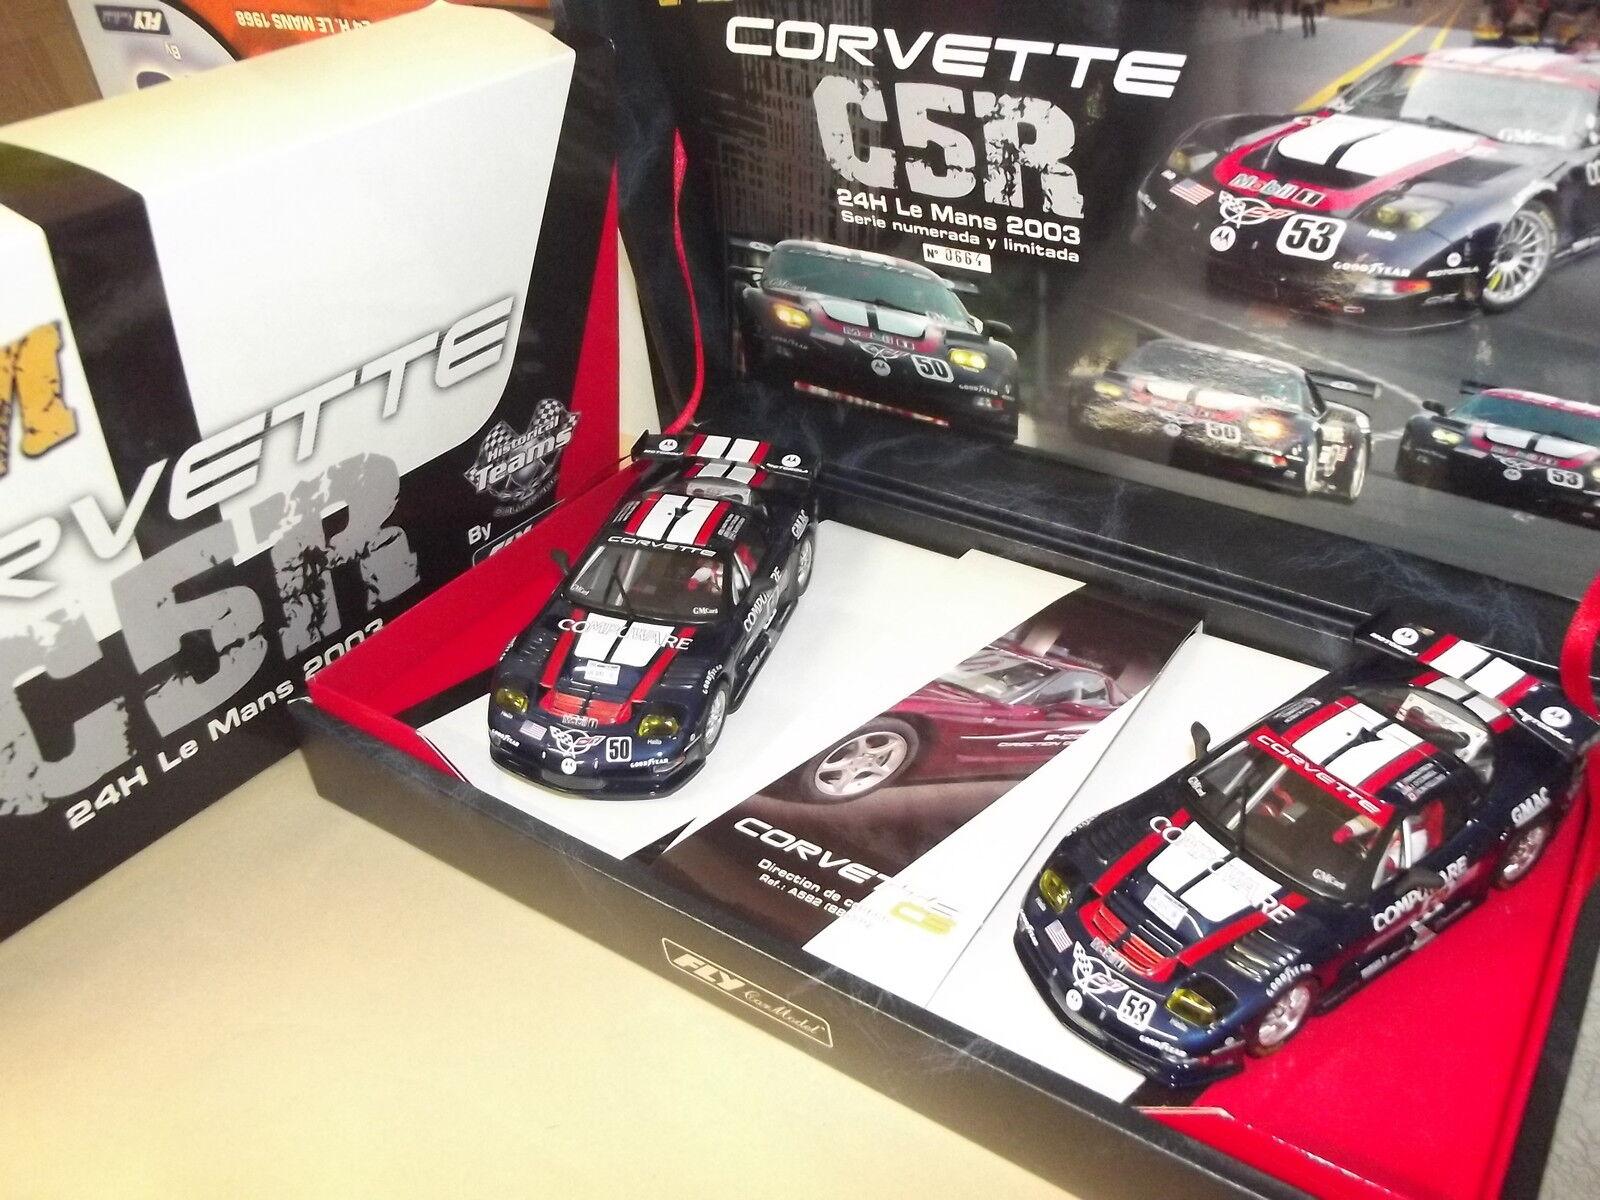 TEAM 6 CORVETTE-C5R-24K LE MANS 2003-96021-HISTORICAL-FLY-CAR--SLOT-1 32-B7